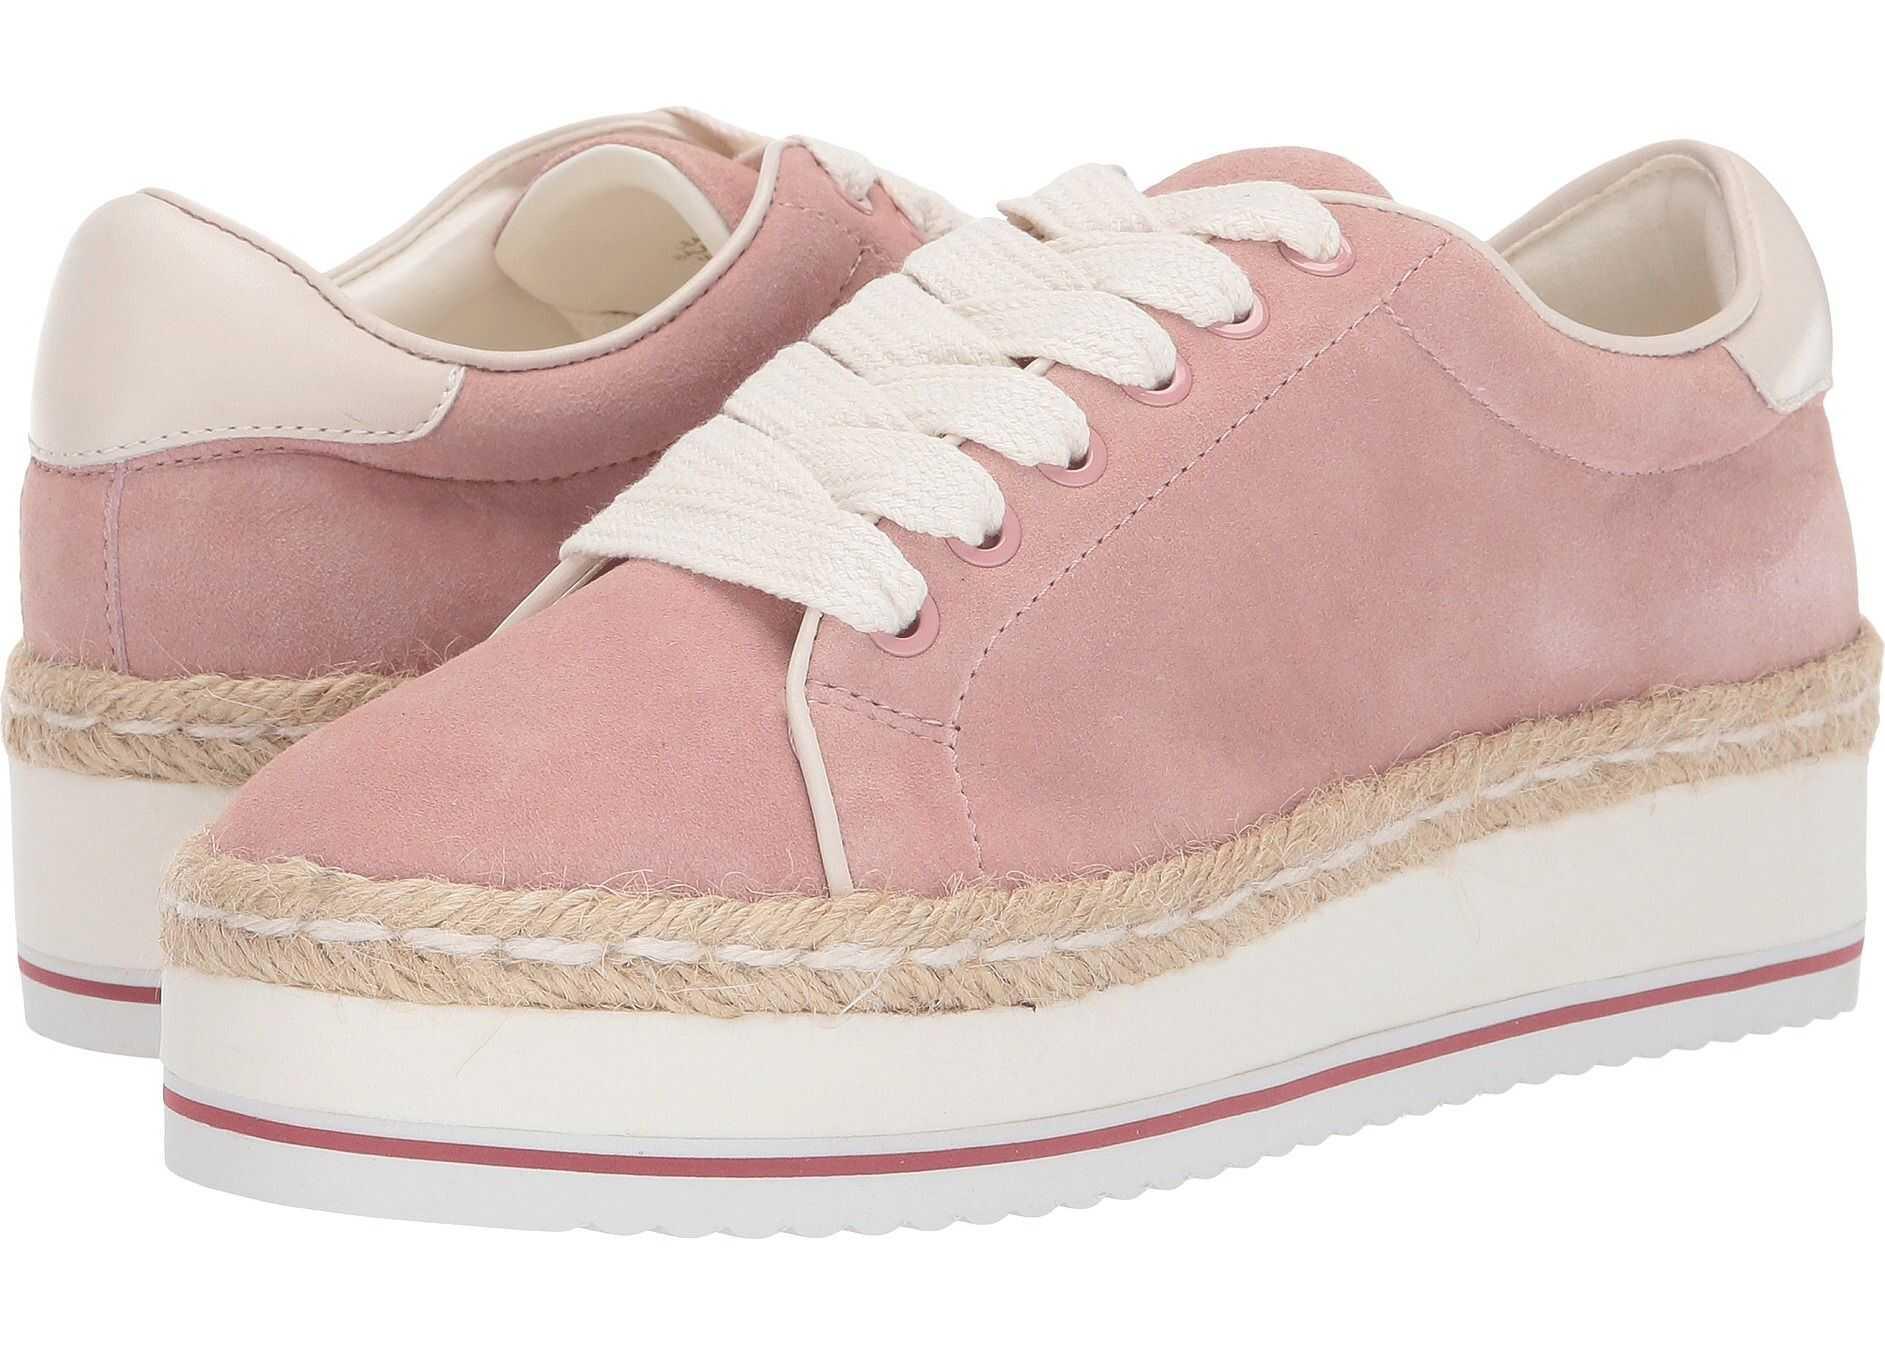 Nine West Evie Medium Pink